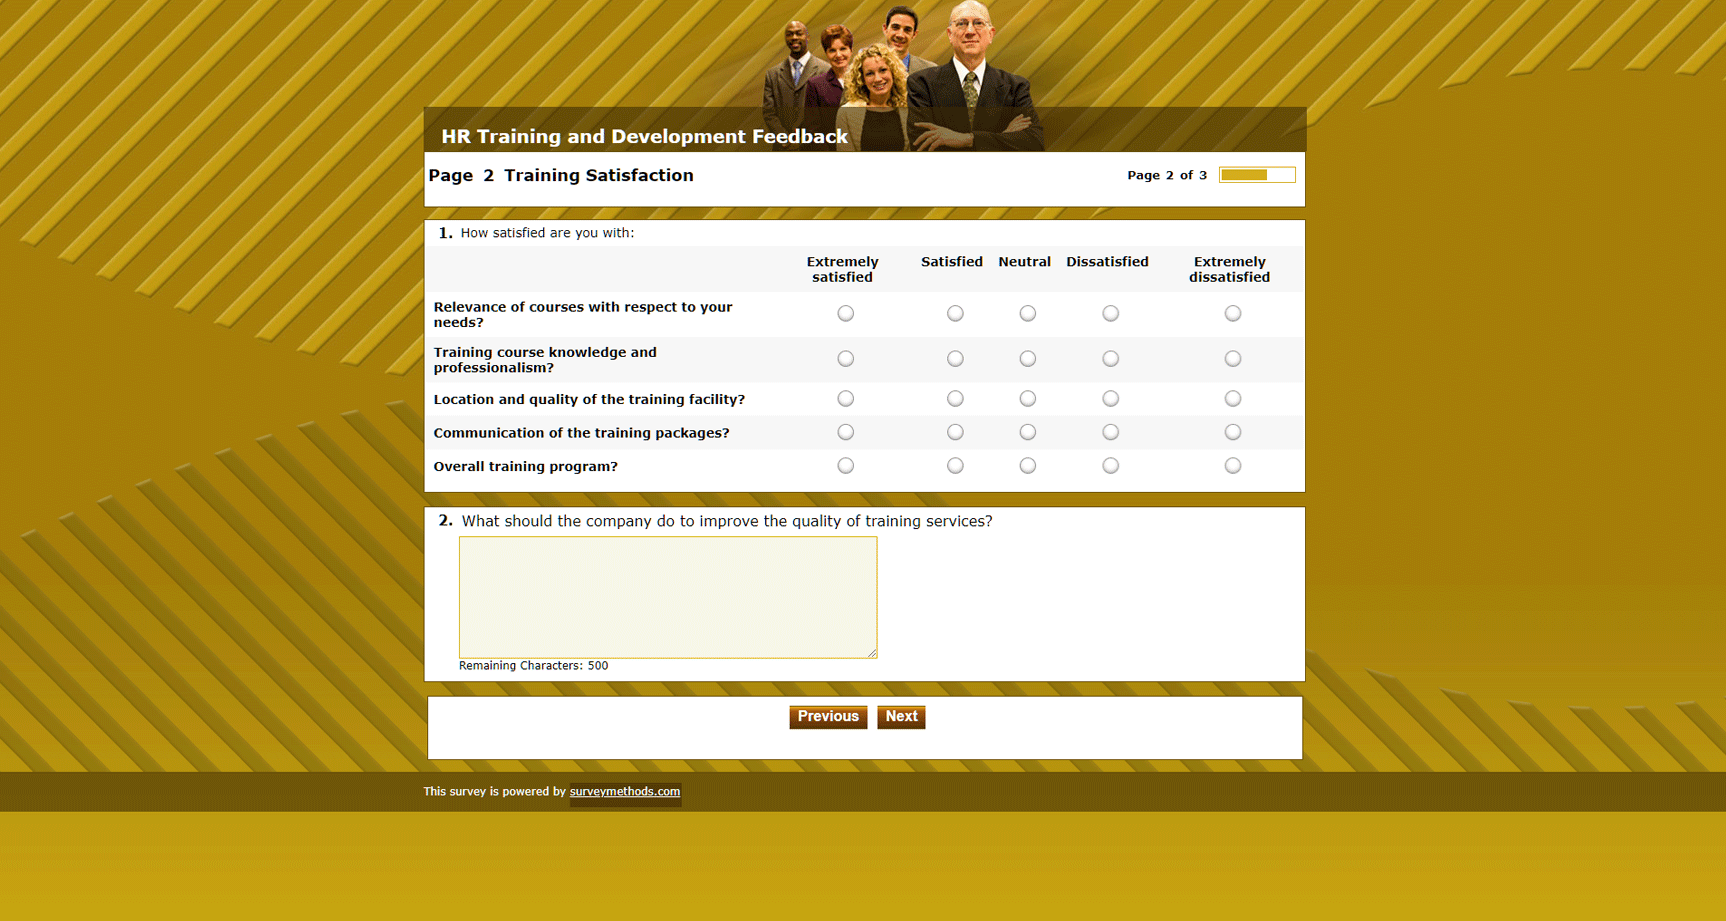 HR Training and Development Survey